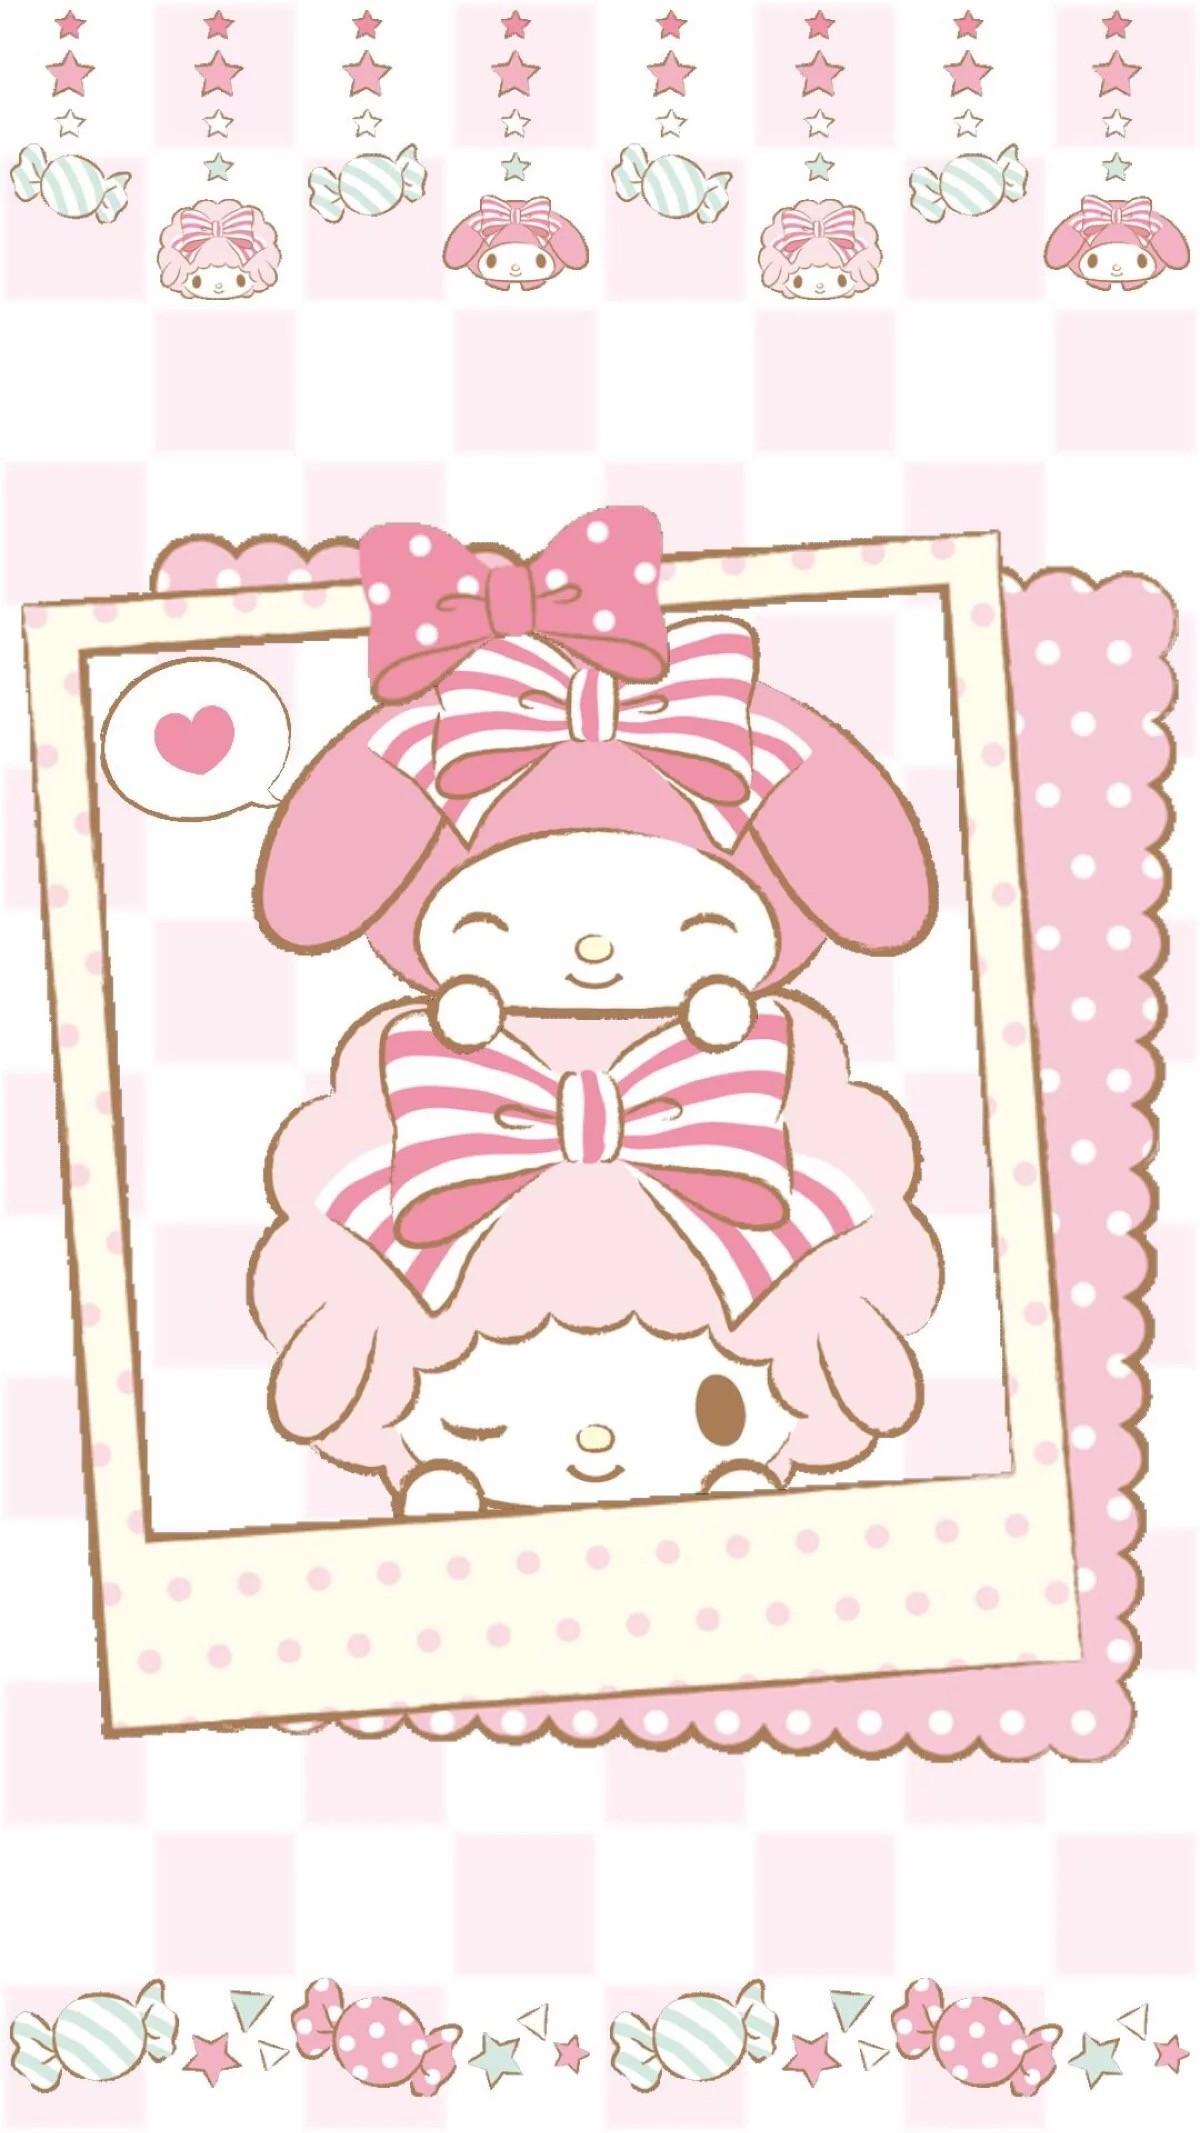 Cute Kitty Wallpapers Free My Melody Wallpaper 183 ① Wallpapertag